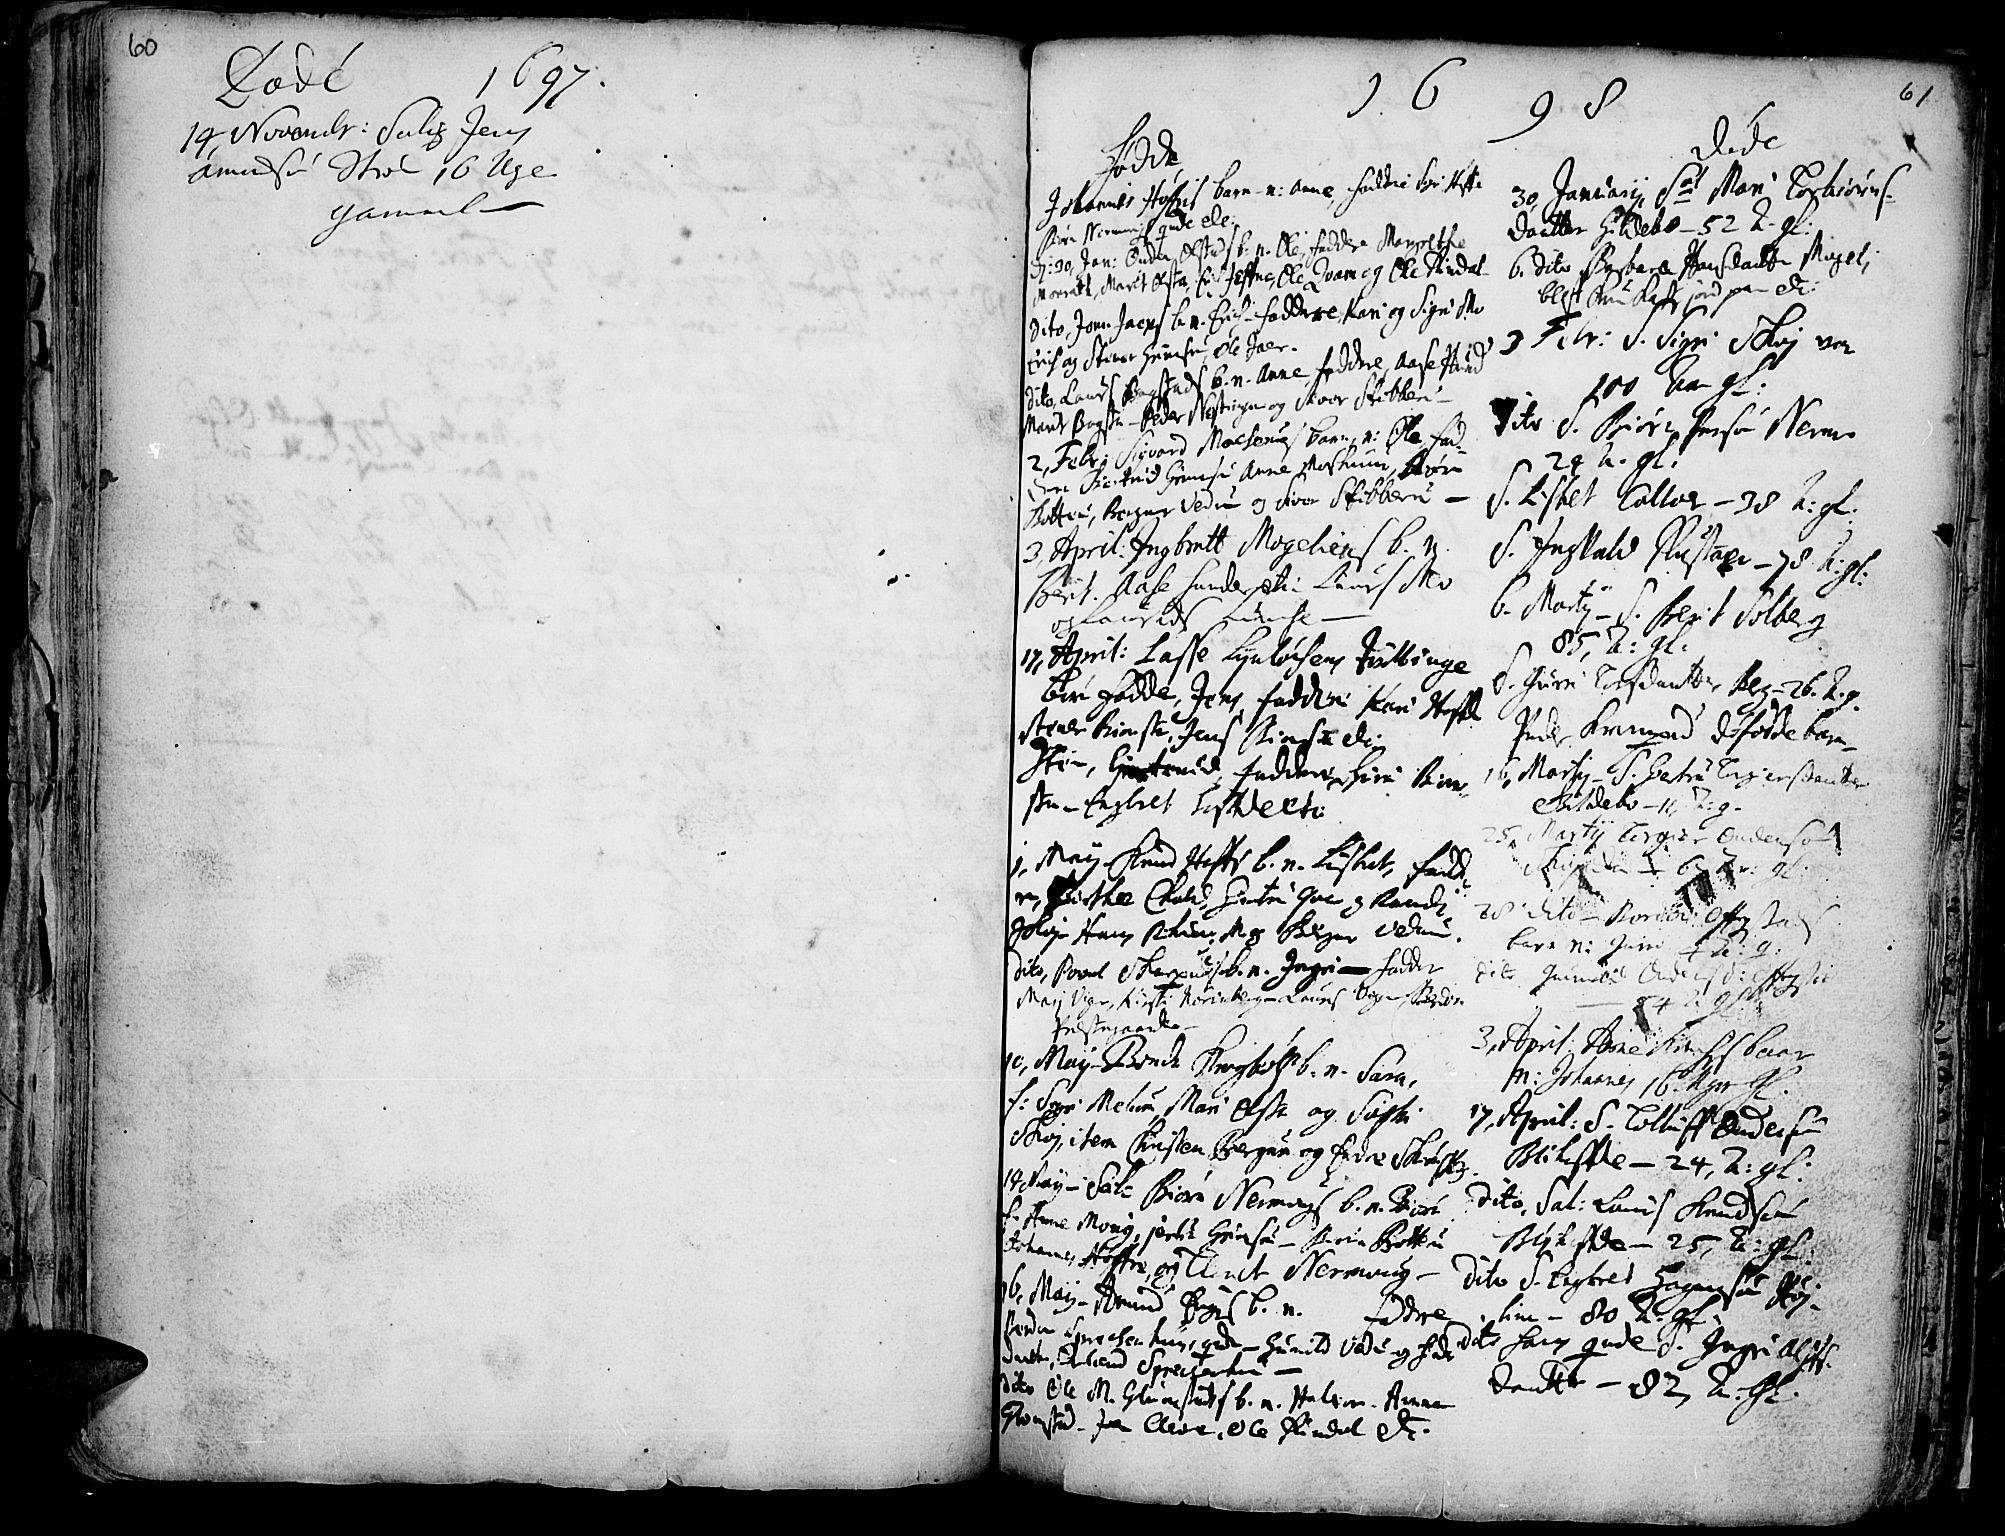 SAH, Øyer prestekontor, Ministerialbok nr. 1, 1671-1727, s. 60-61